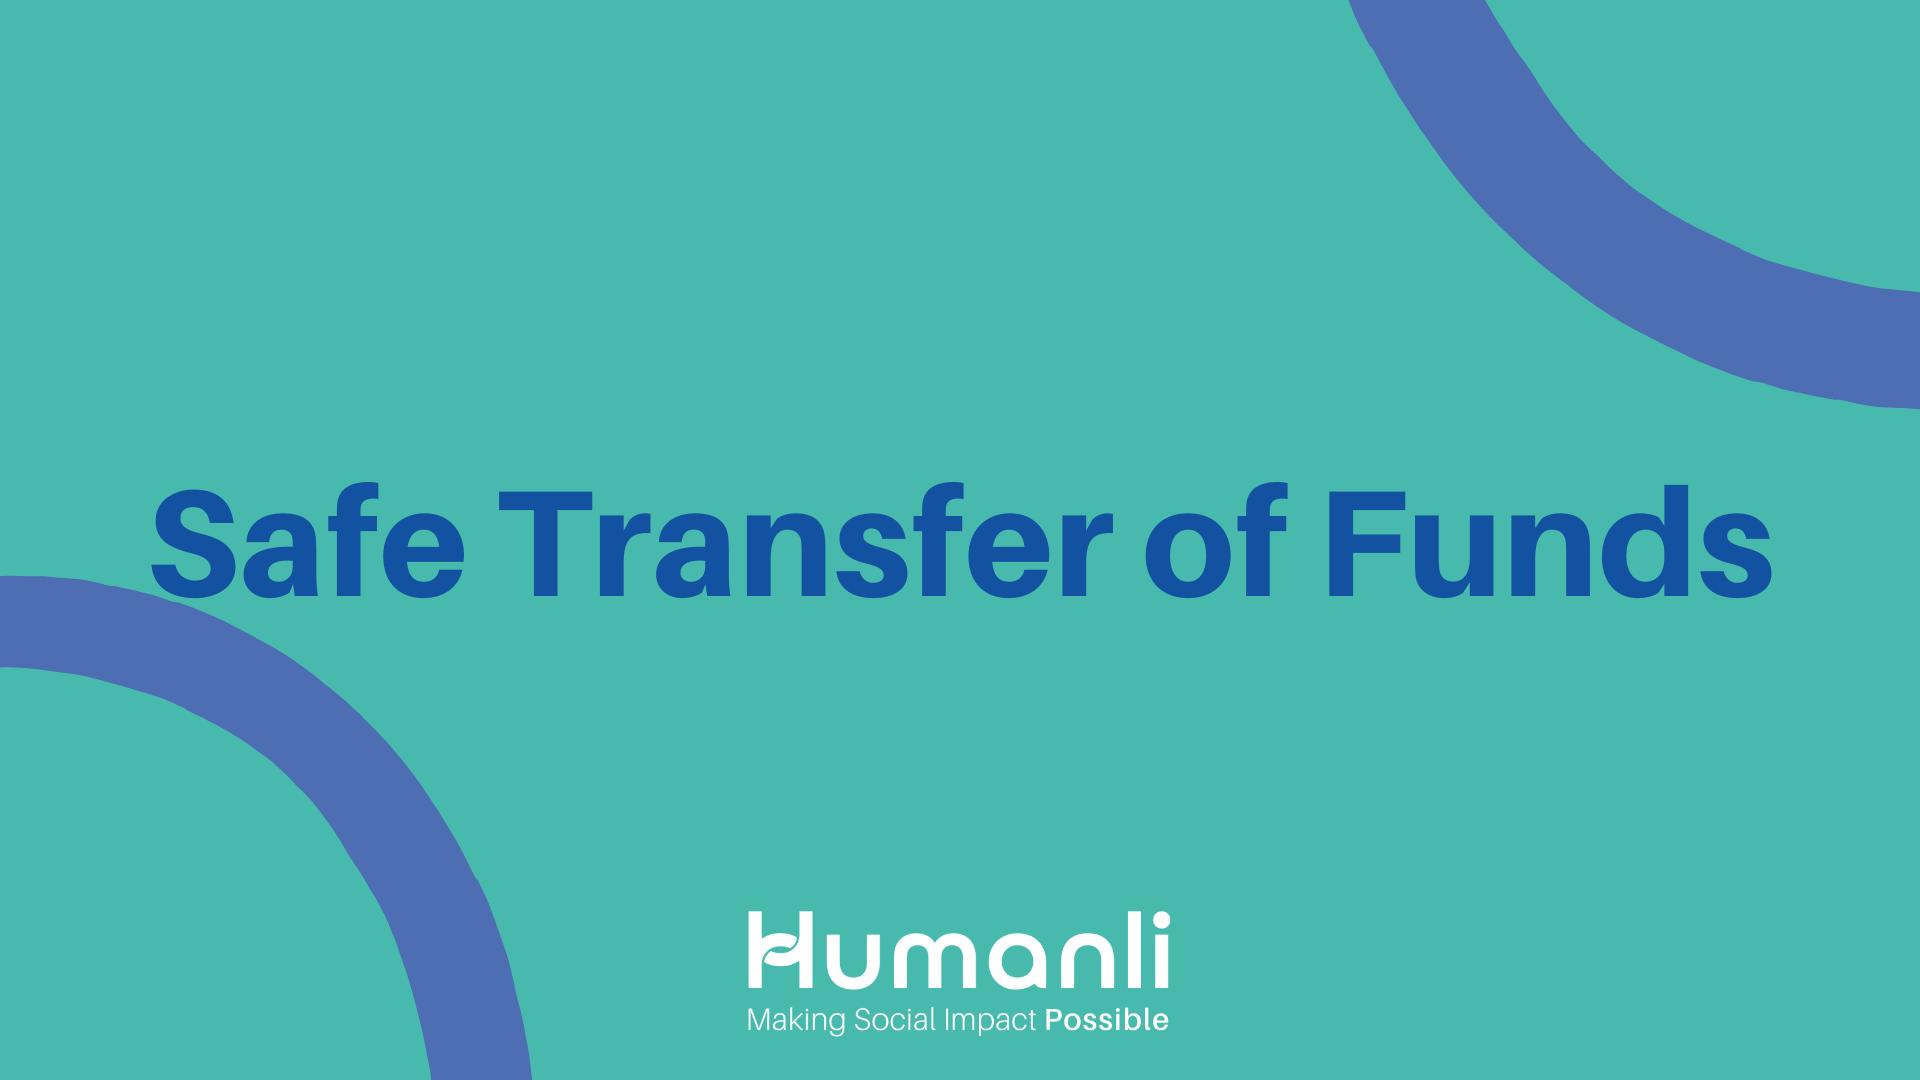 Safe Transfer of Funds